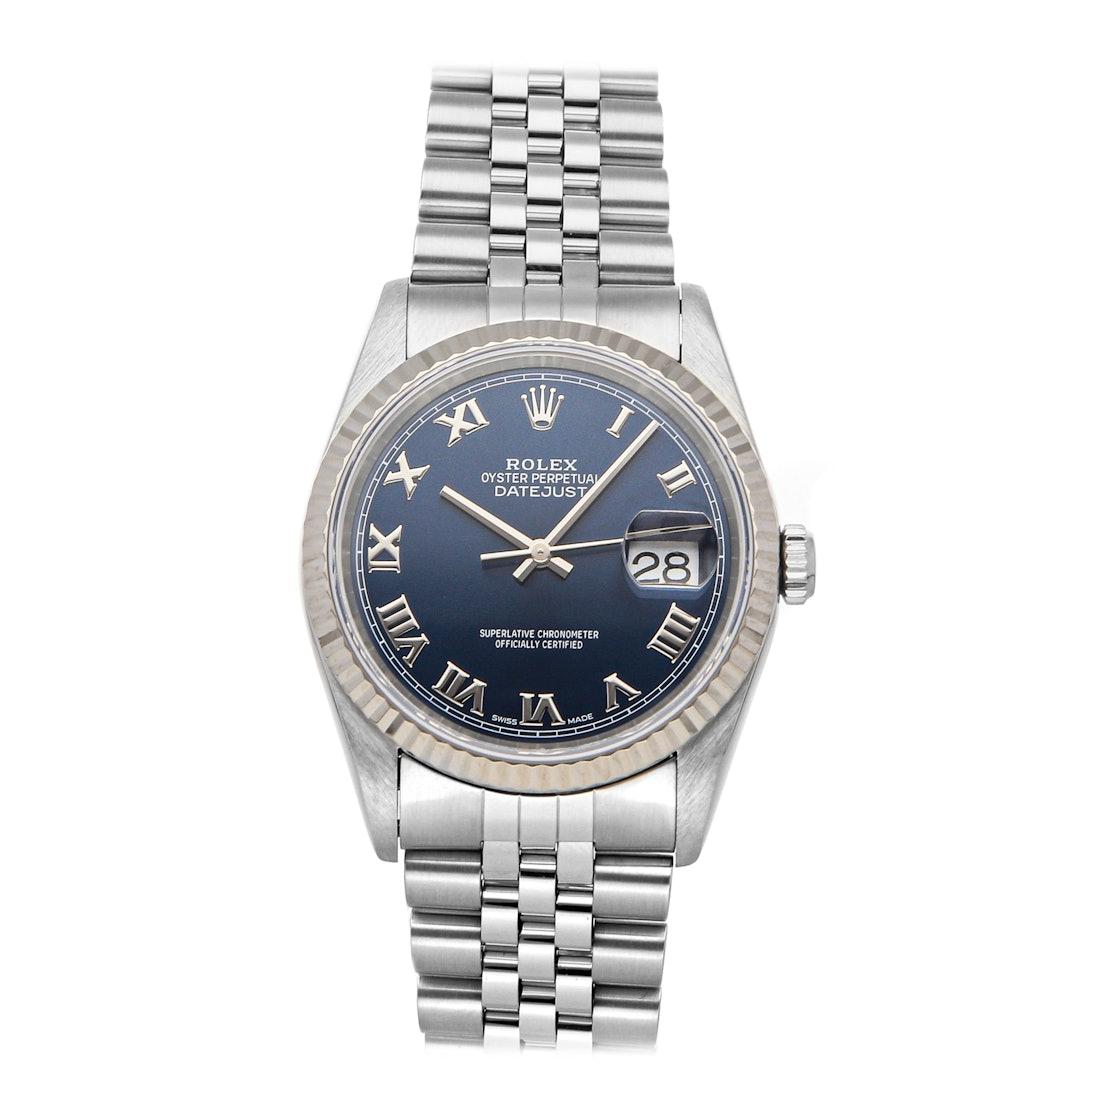 Rolex Datejust 16234